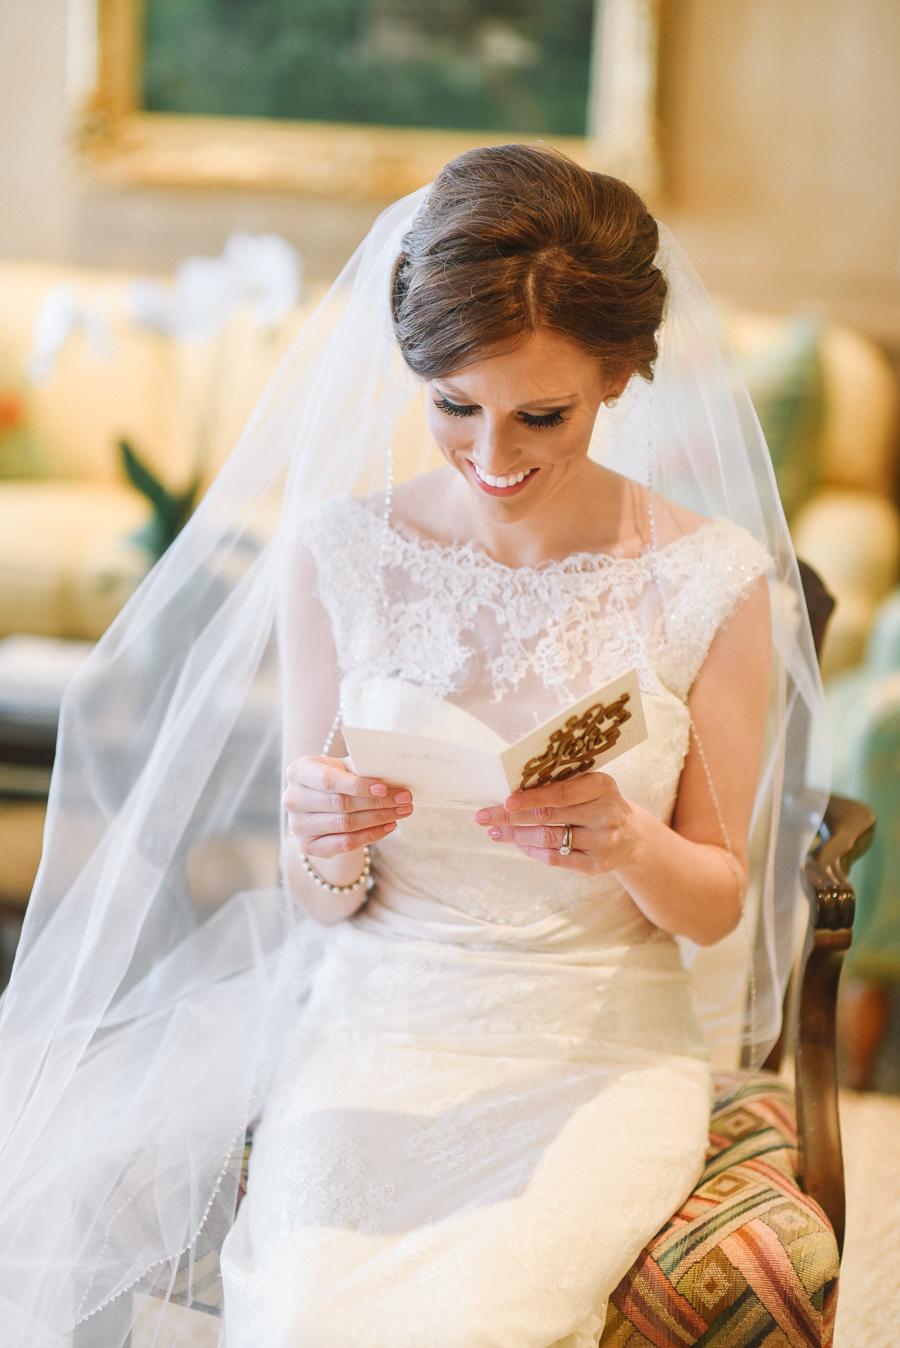 Bloomfield_Hills_Country_Club_Wedding-23.jpg